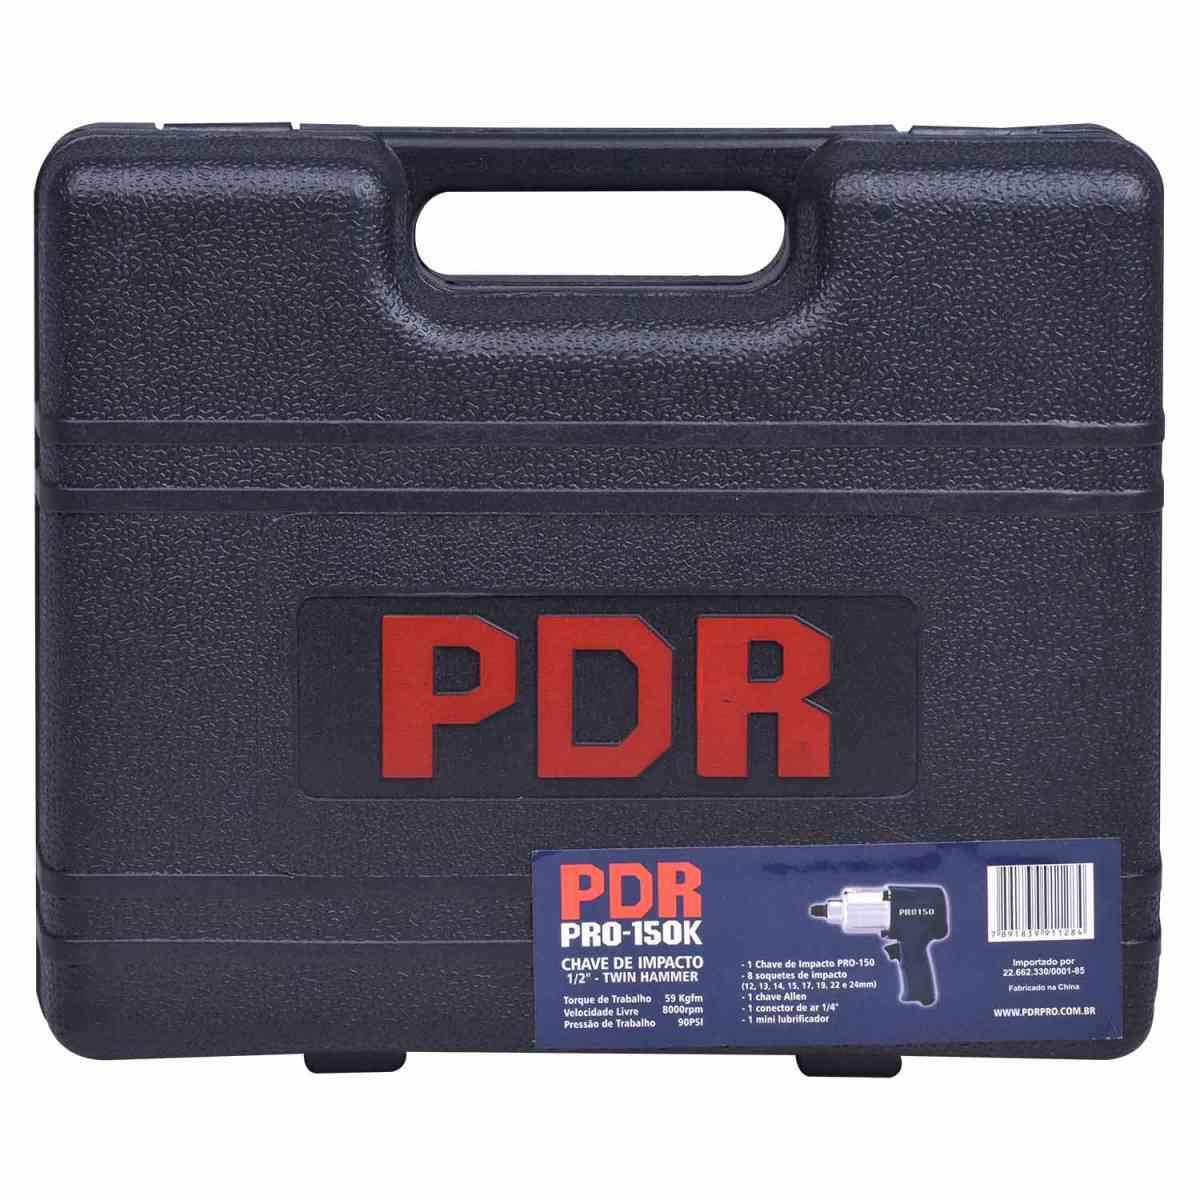 "CHAVE DE IMPACTO 1/2"" TWIN HAMMER COM MALETA  - PRO-150K PDR PRO"